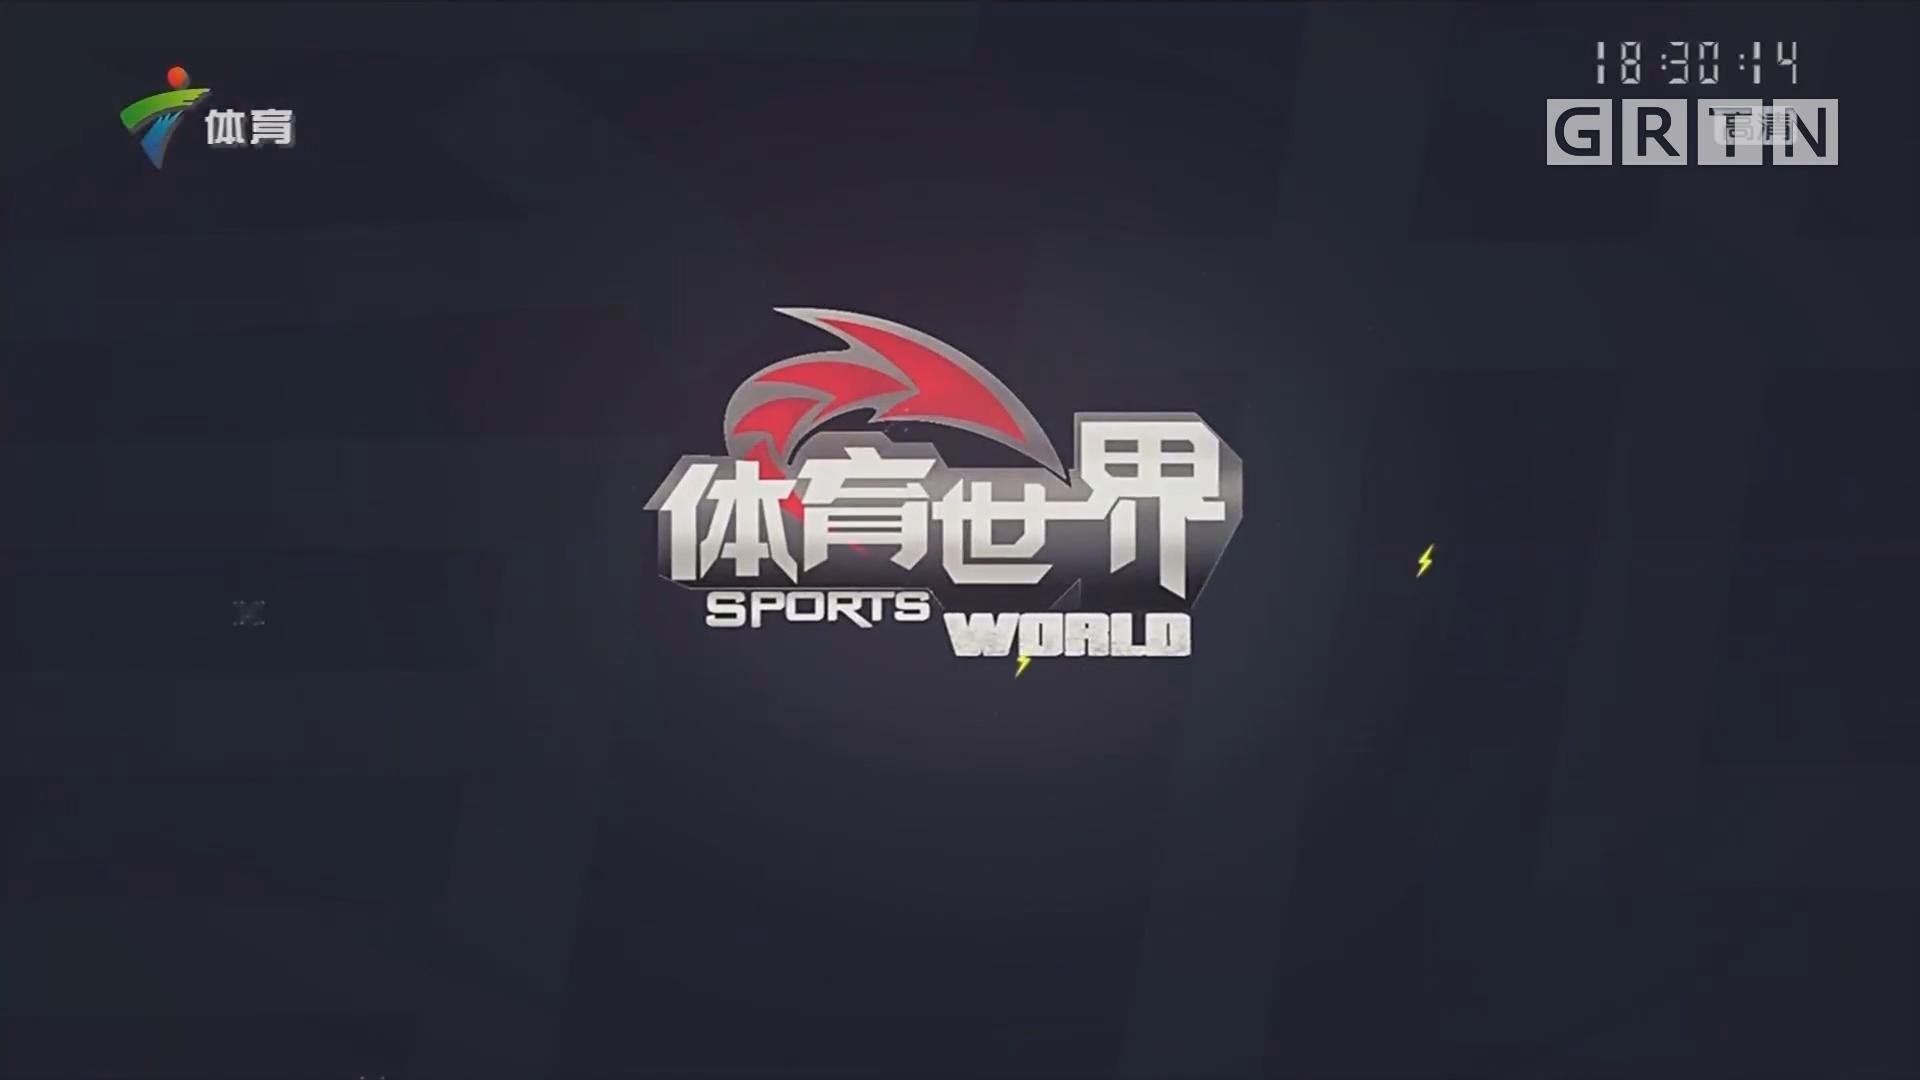 [HD][2018-10-31]体育世界:公益备战两不误 太阳神明星队卫冕之路启航